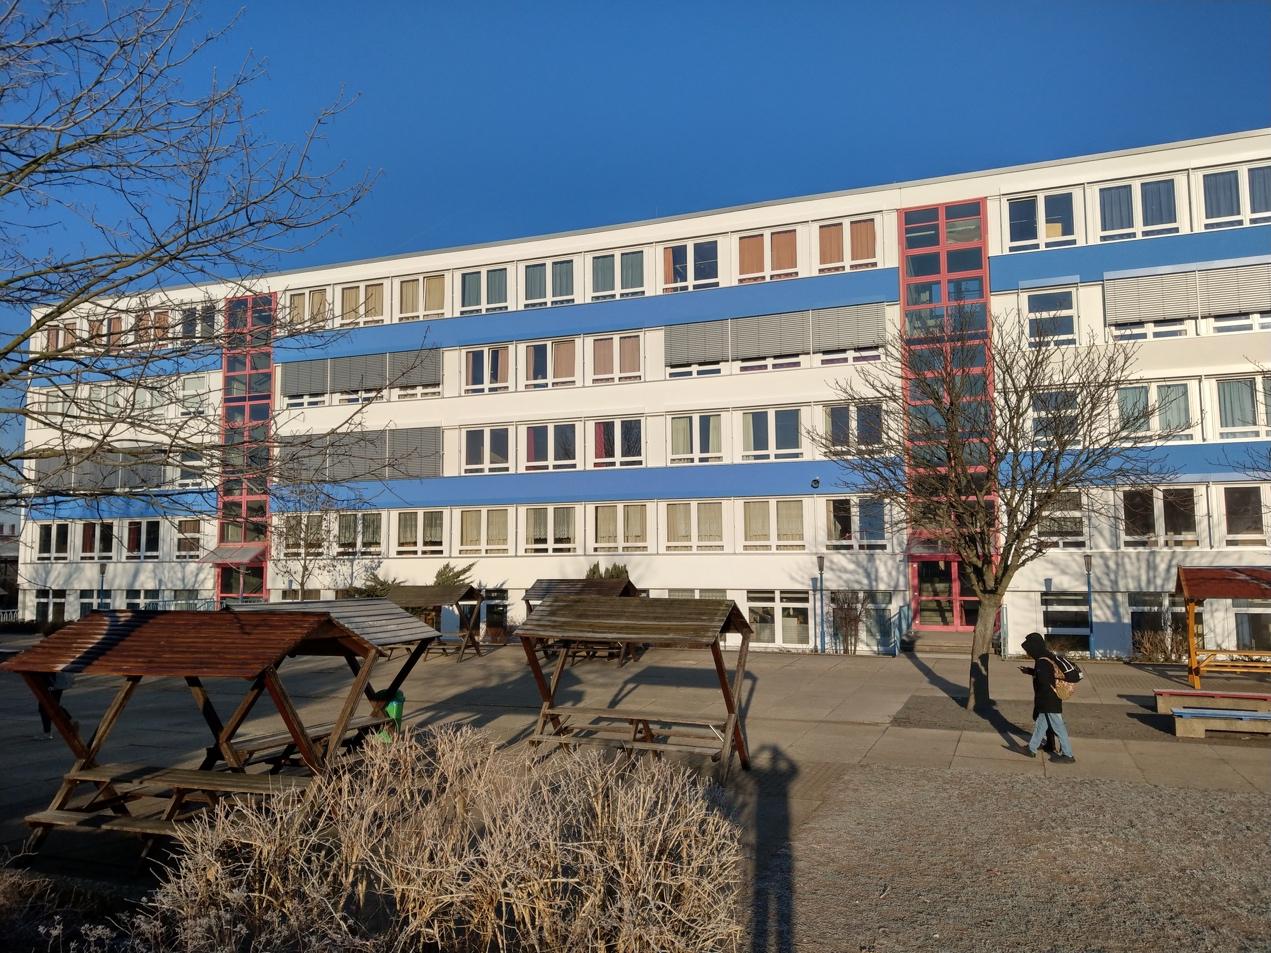 Oberschule Naunhof